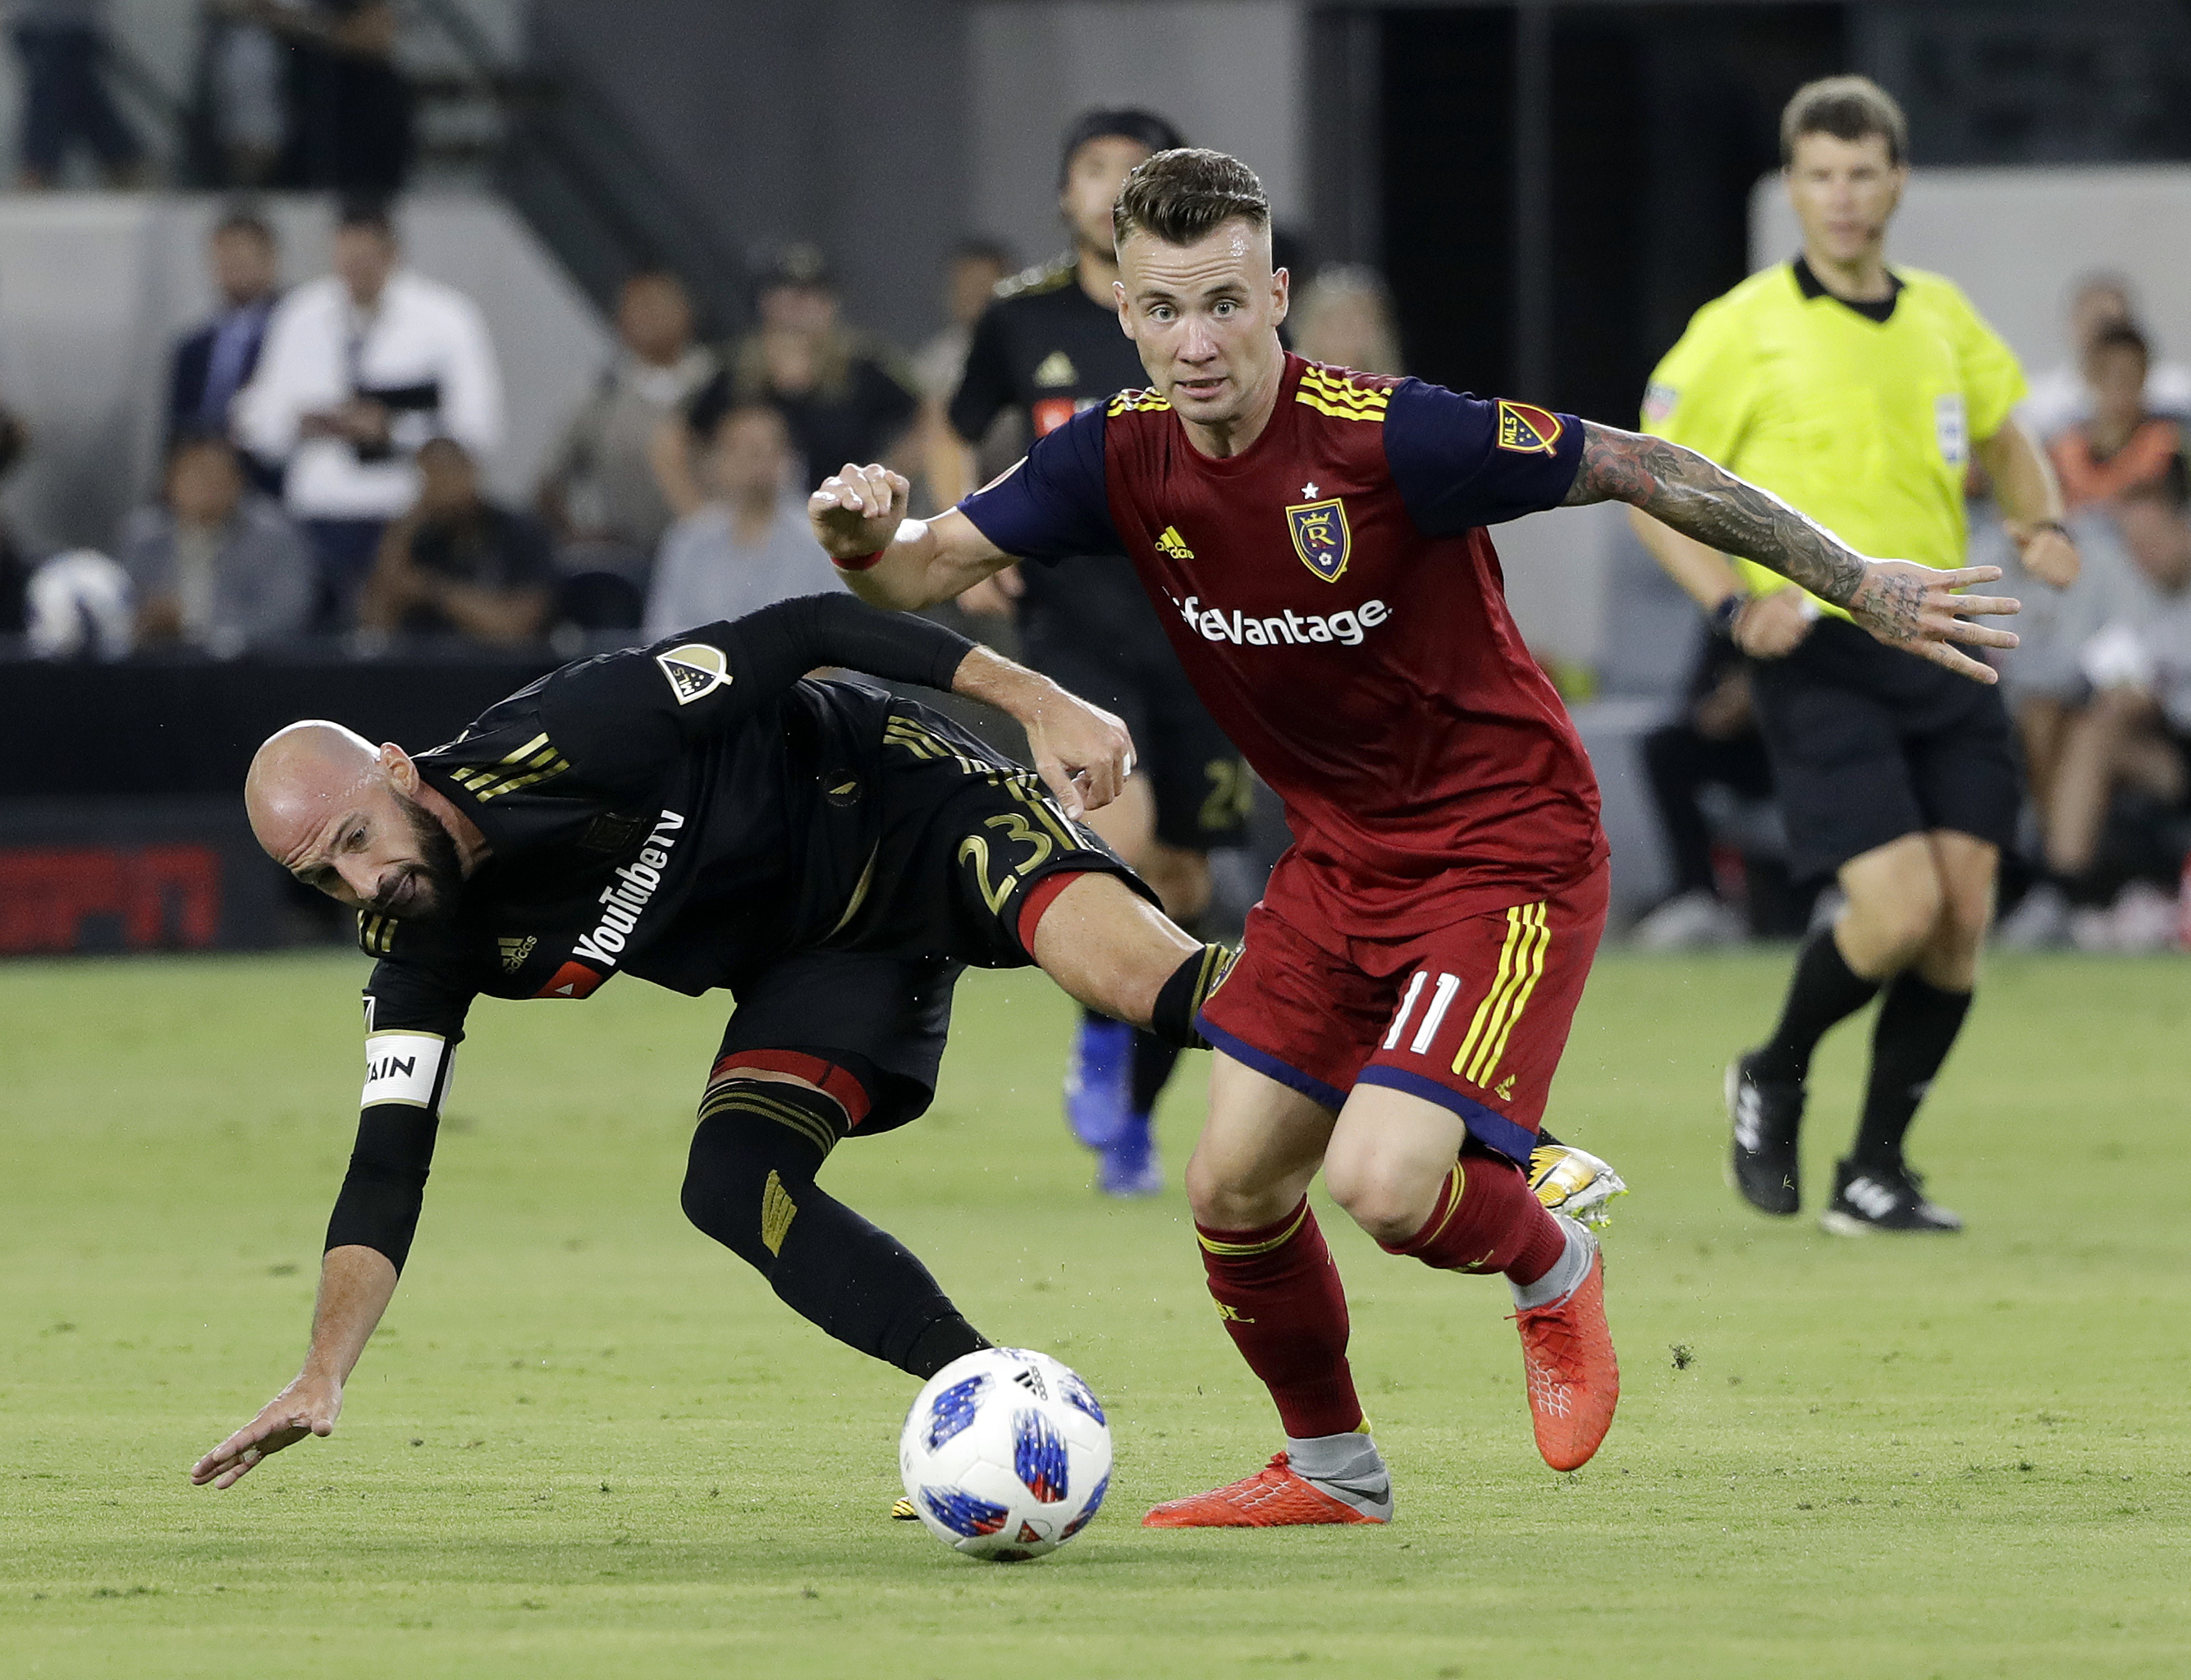 Real Salt Lake midfielder Albert Rusnak (11) dribbles past Los Angeles FC defender Laurent Ciman (23) during the first half of an MLS soccer match Wednesday, Aug. 15, 2018, in Los Angeles. (AP Photo/Marcio Jose Sanchez)